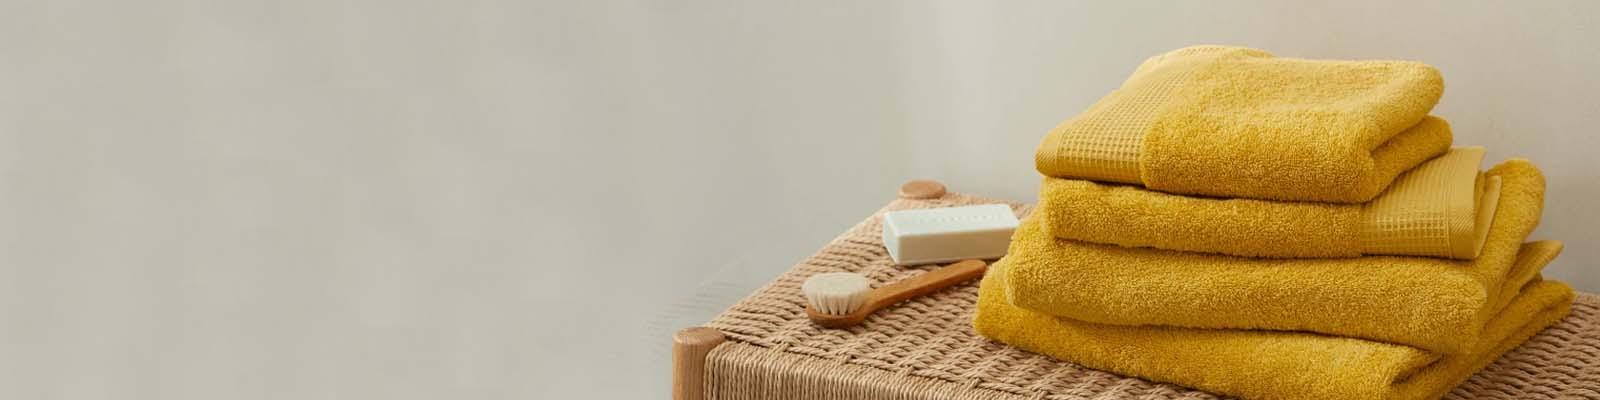 tata towels wholesale